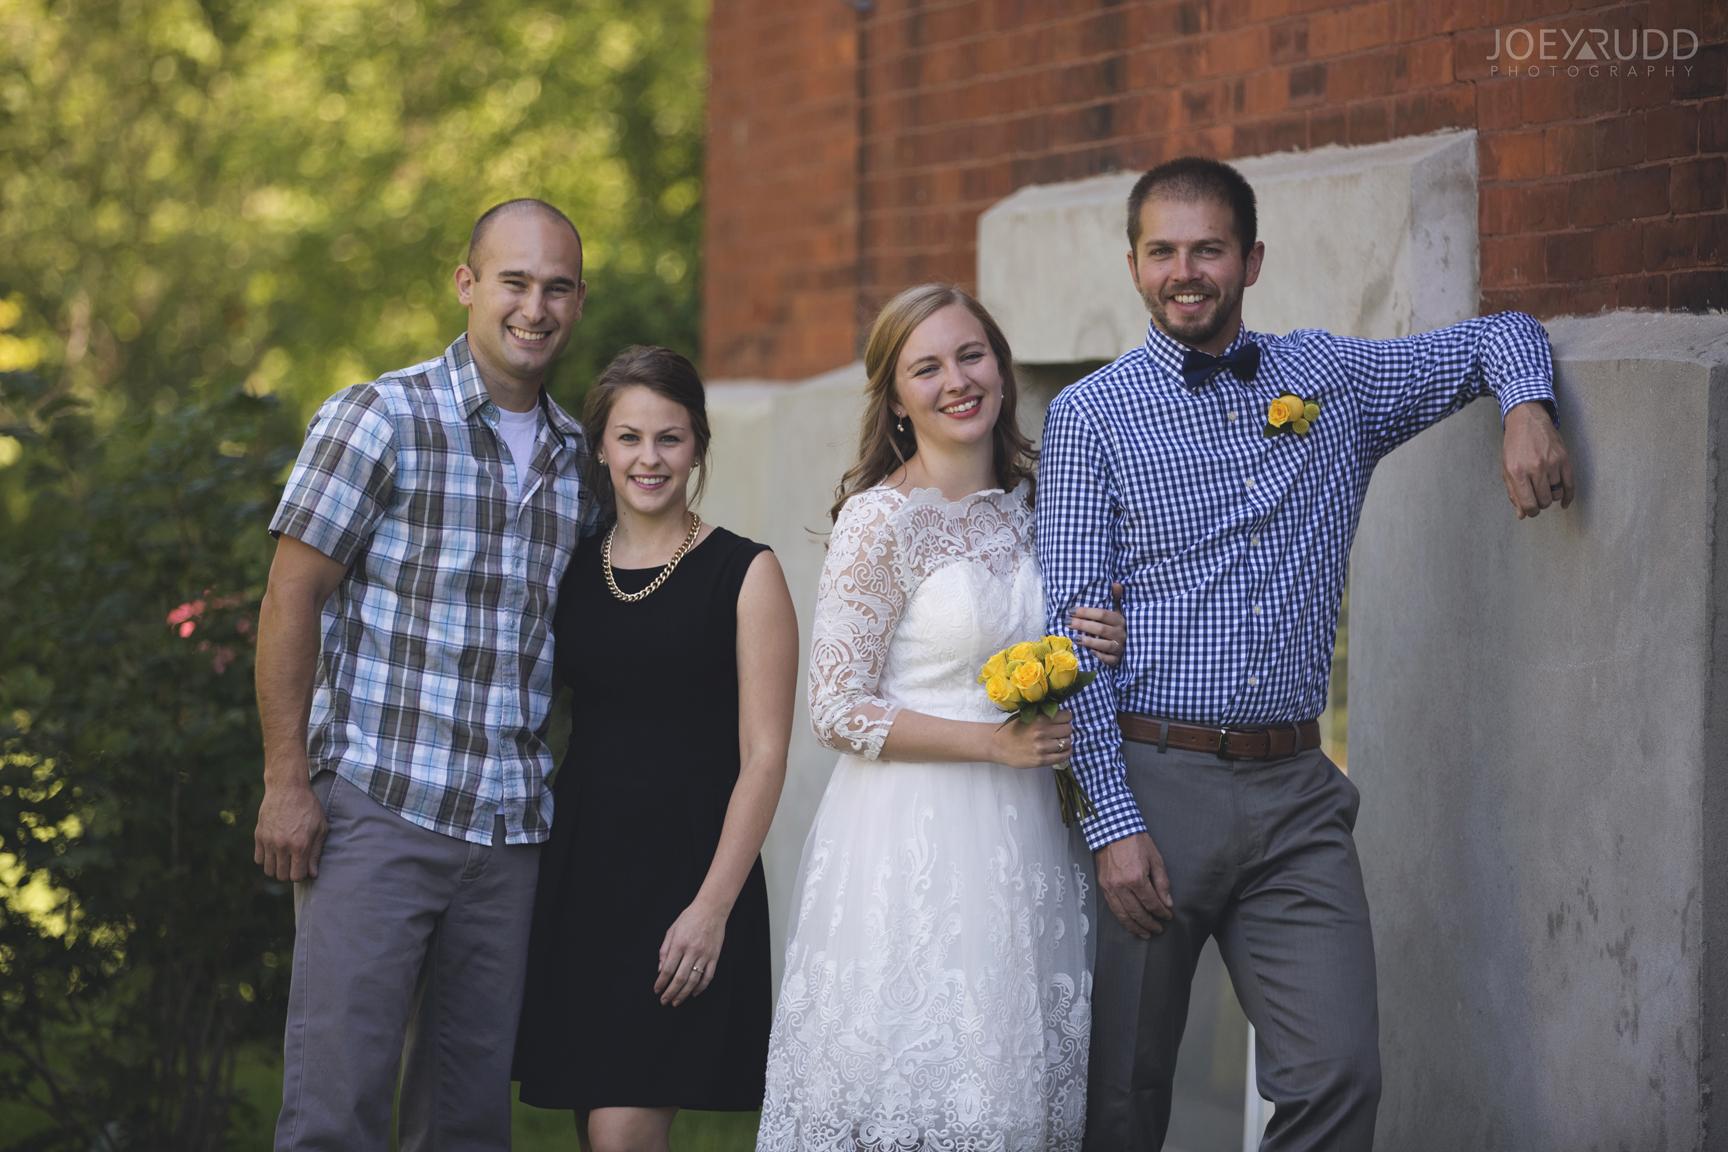 Ottawa Elopement by Joey Rudd Photography Ottawa Wedding Photographer Mer Bleue Ottawa Wedding Chapel Wedding Party